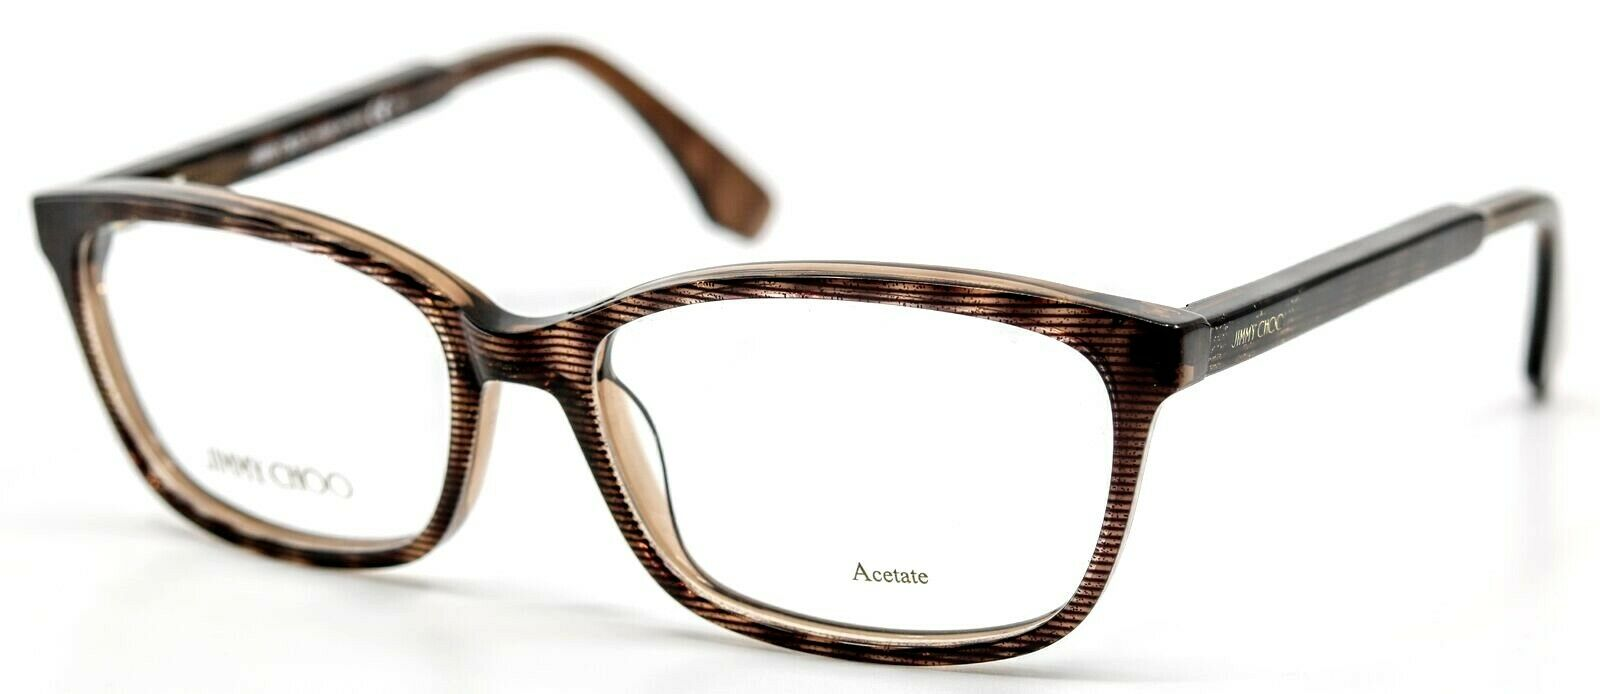 Jimmy Choo Ladies Purple Rectangular Eyeglass Frames